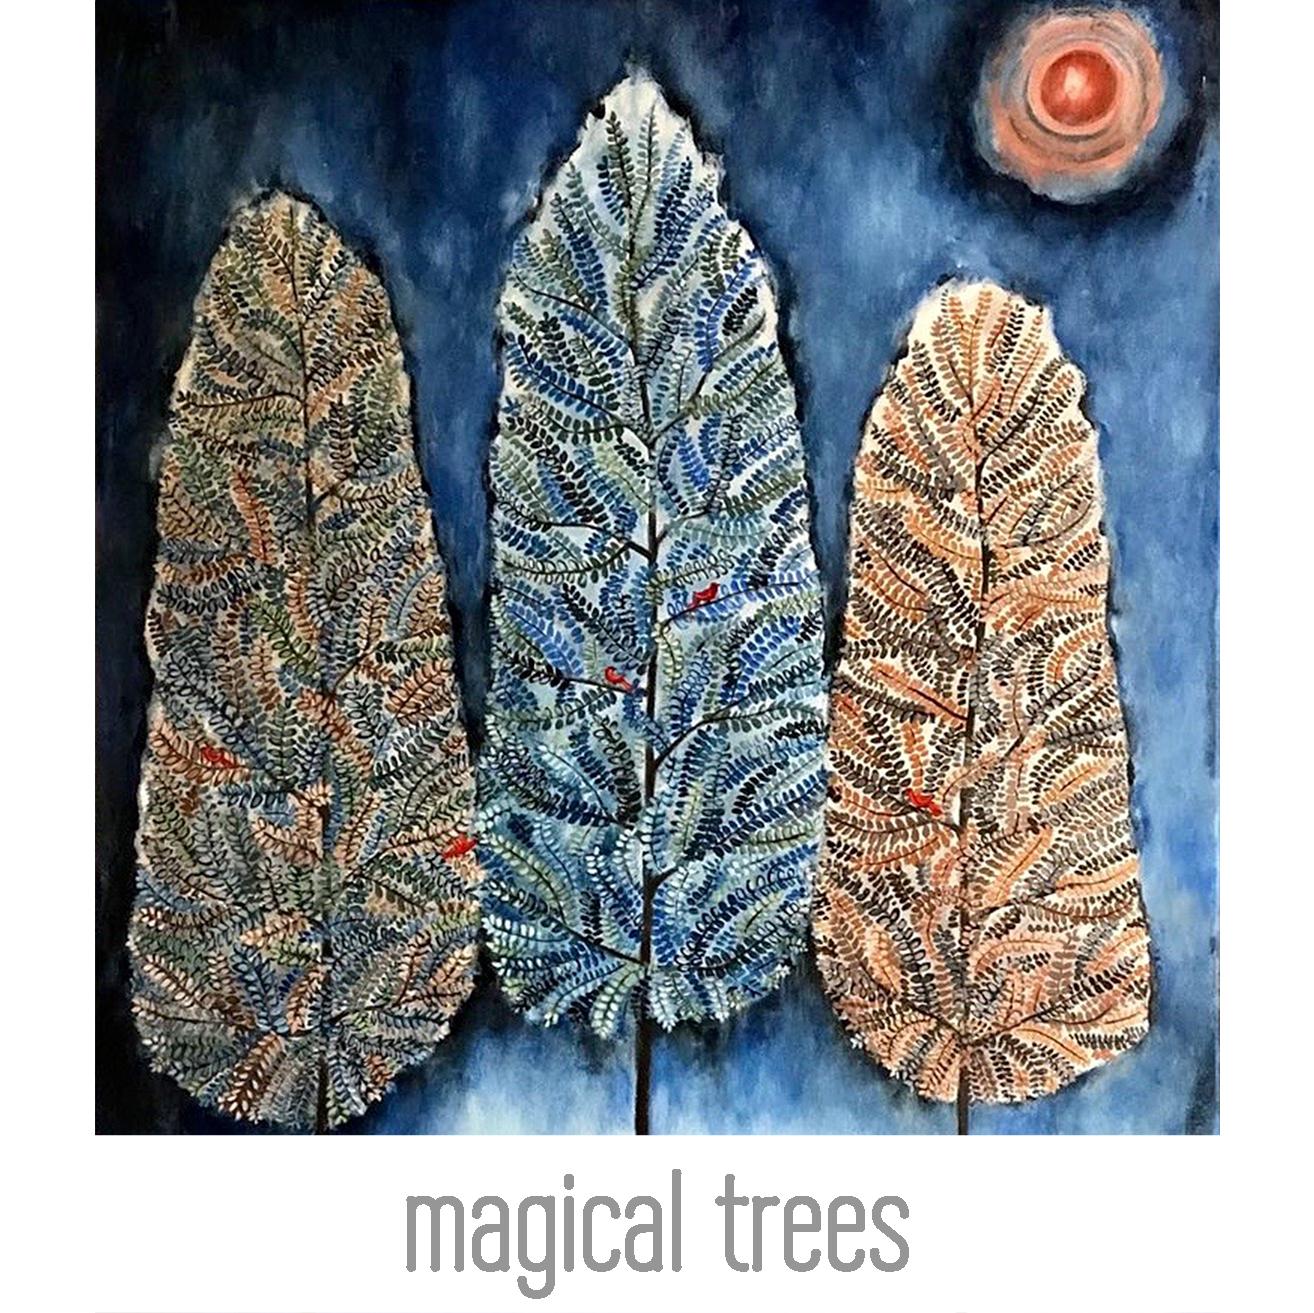 magical_trees-index.jpg